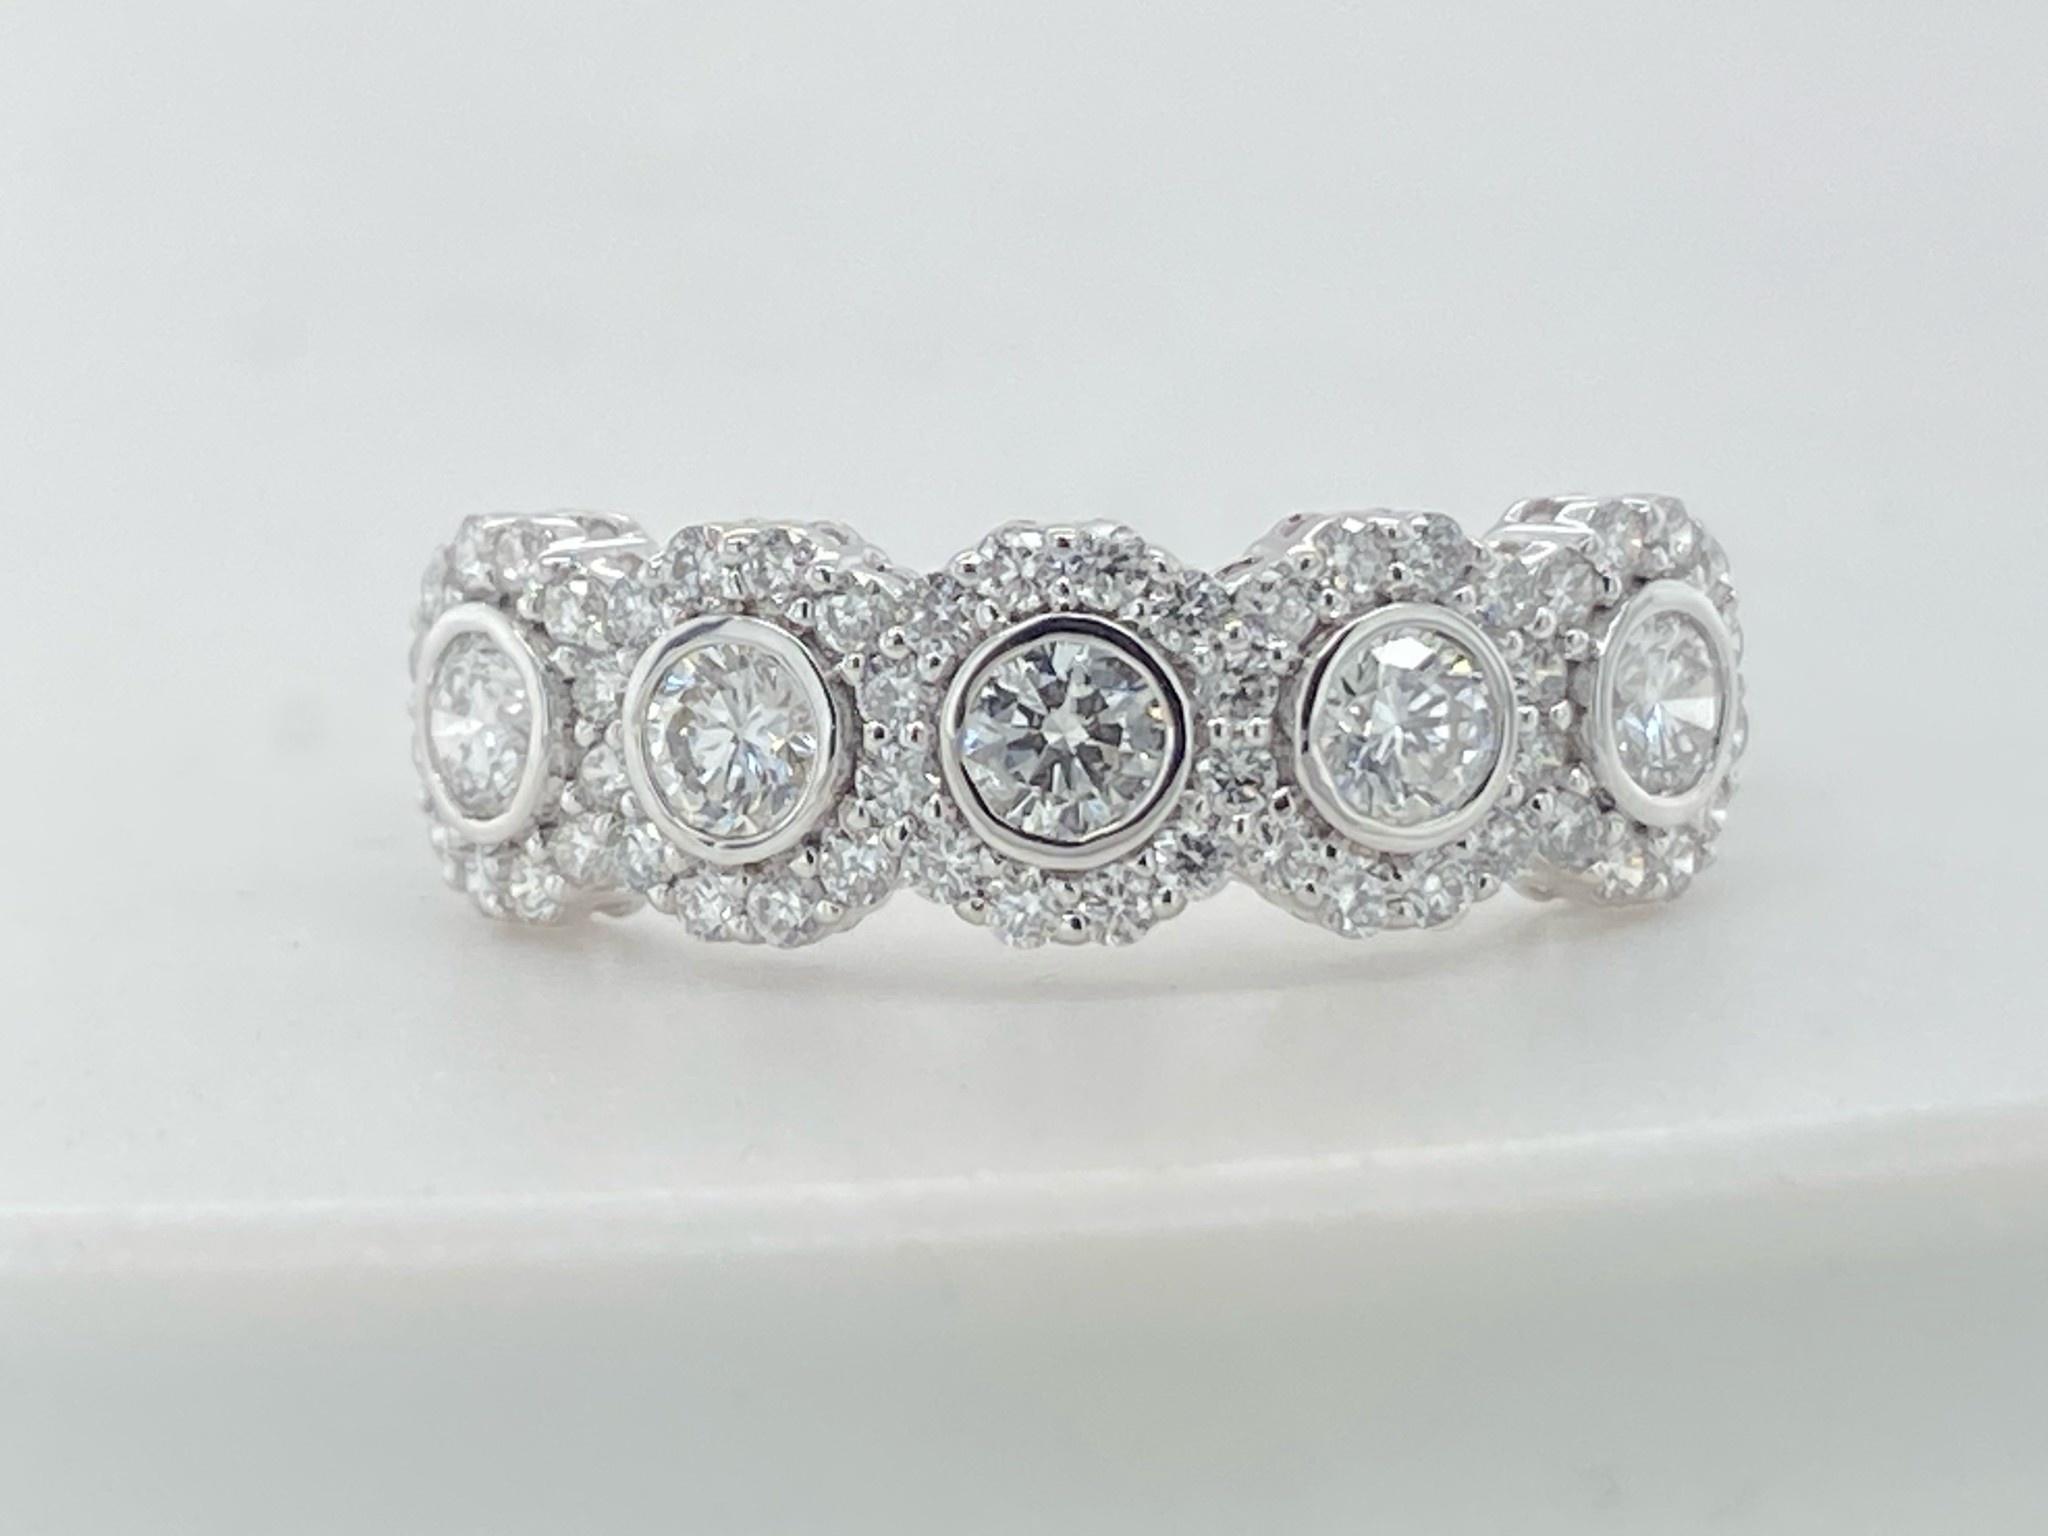 14KW  .75CTTW LG Diamond Fashion Ring